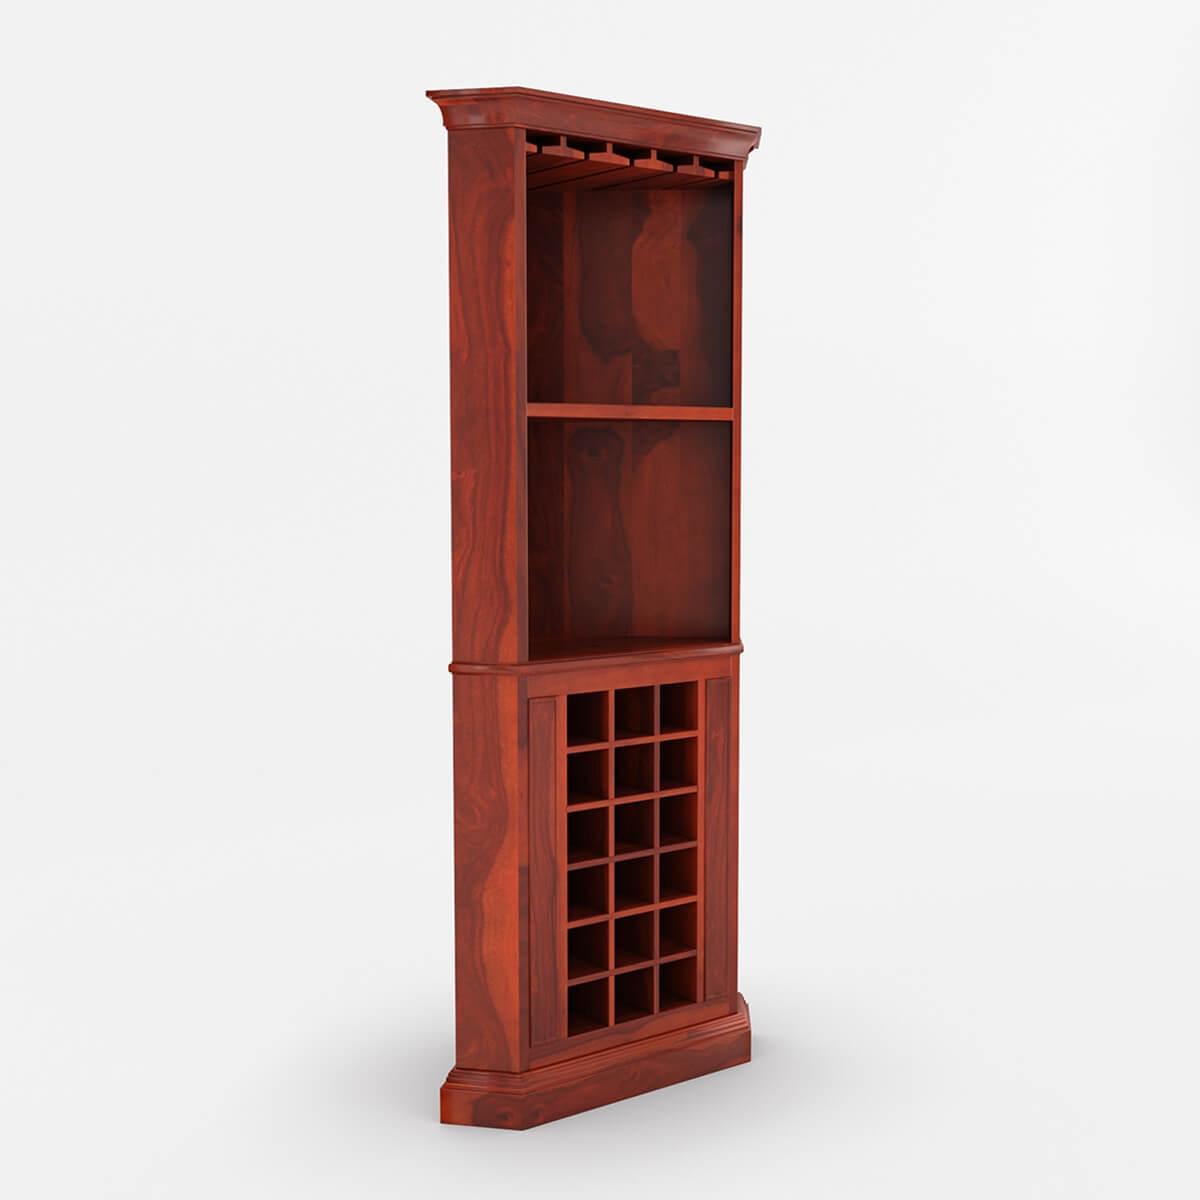 "Louis 76"" Rustic Solid Wood Corner Bar Cabinet"